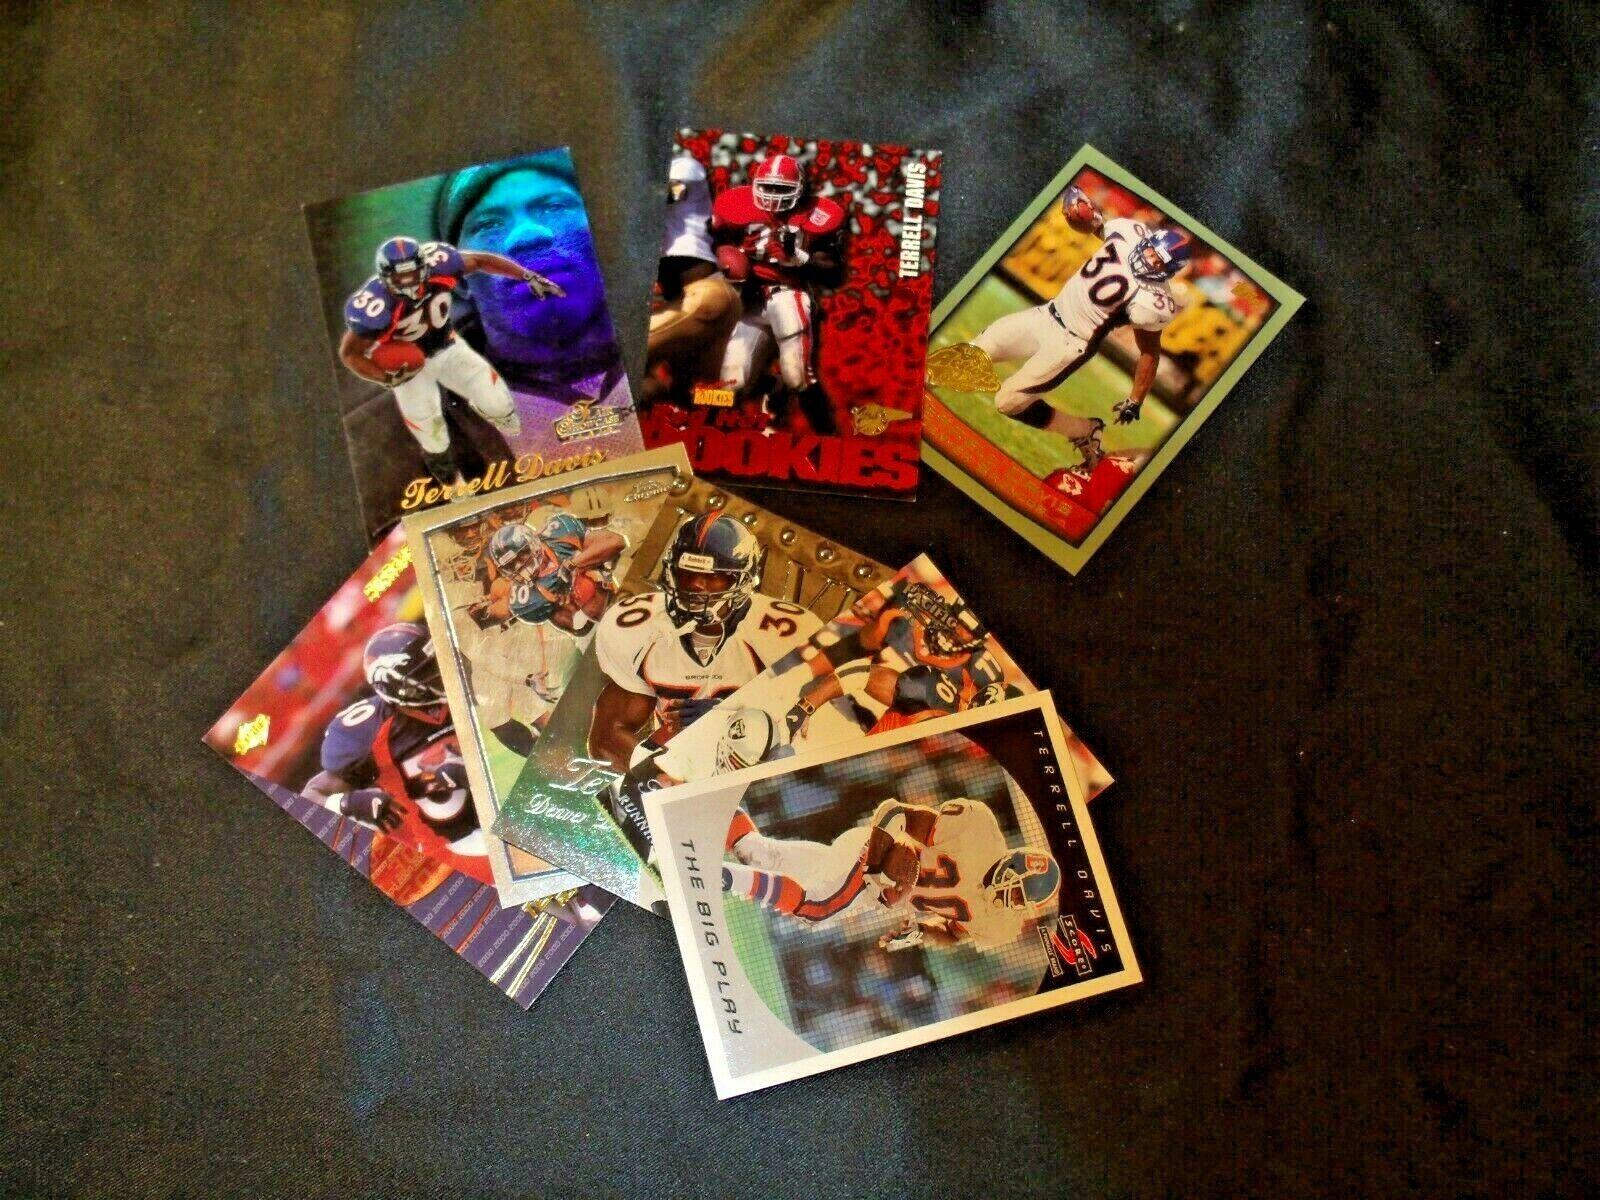 Terrell Davis RB Denver Broncos Football Collectible Trading Cards AA-19FTC3008